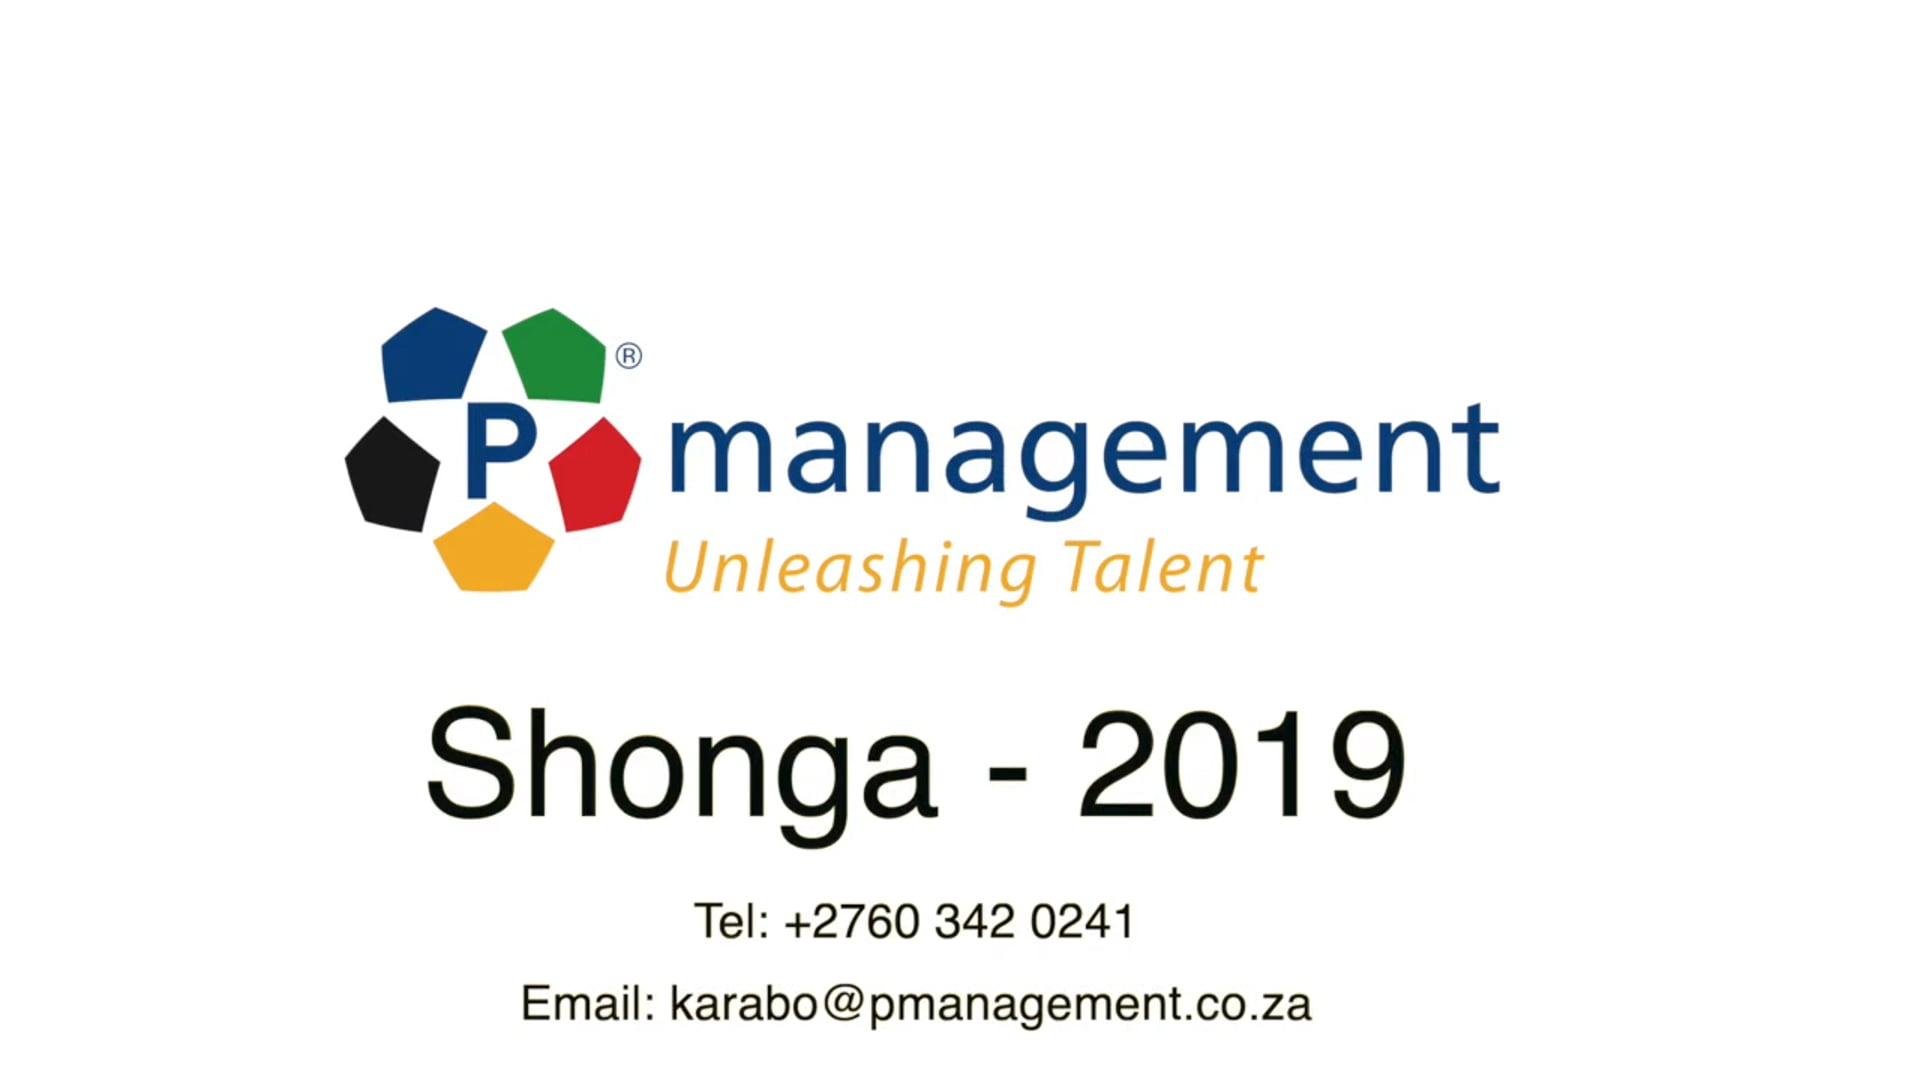 Shonga - Pmanagement